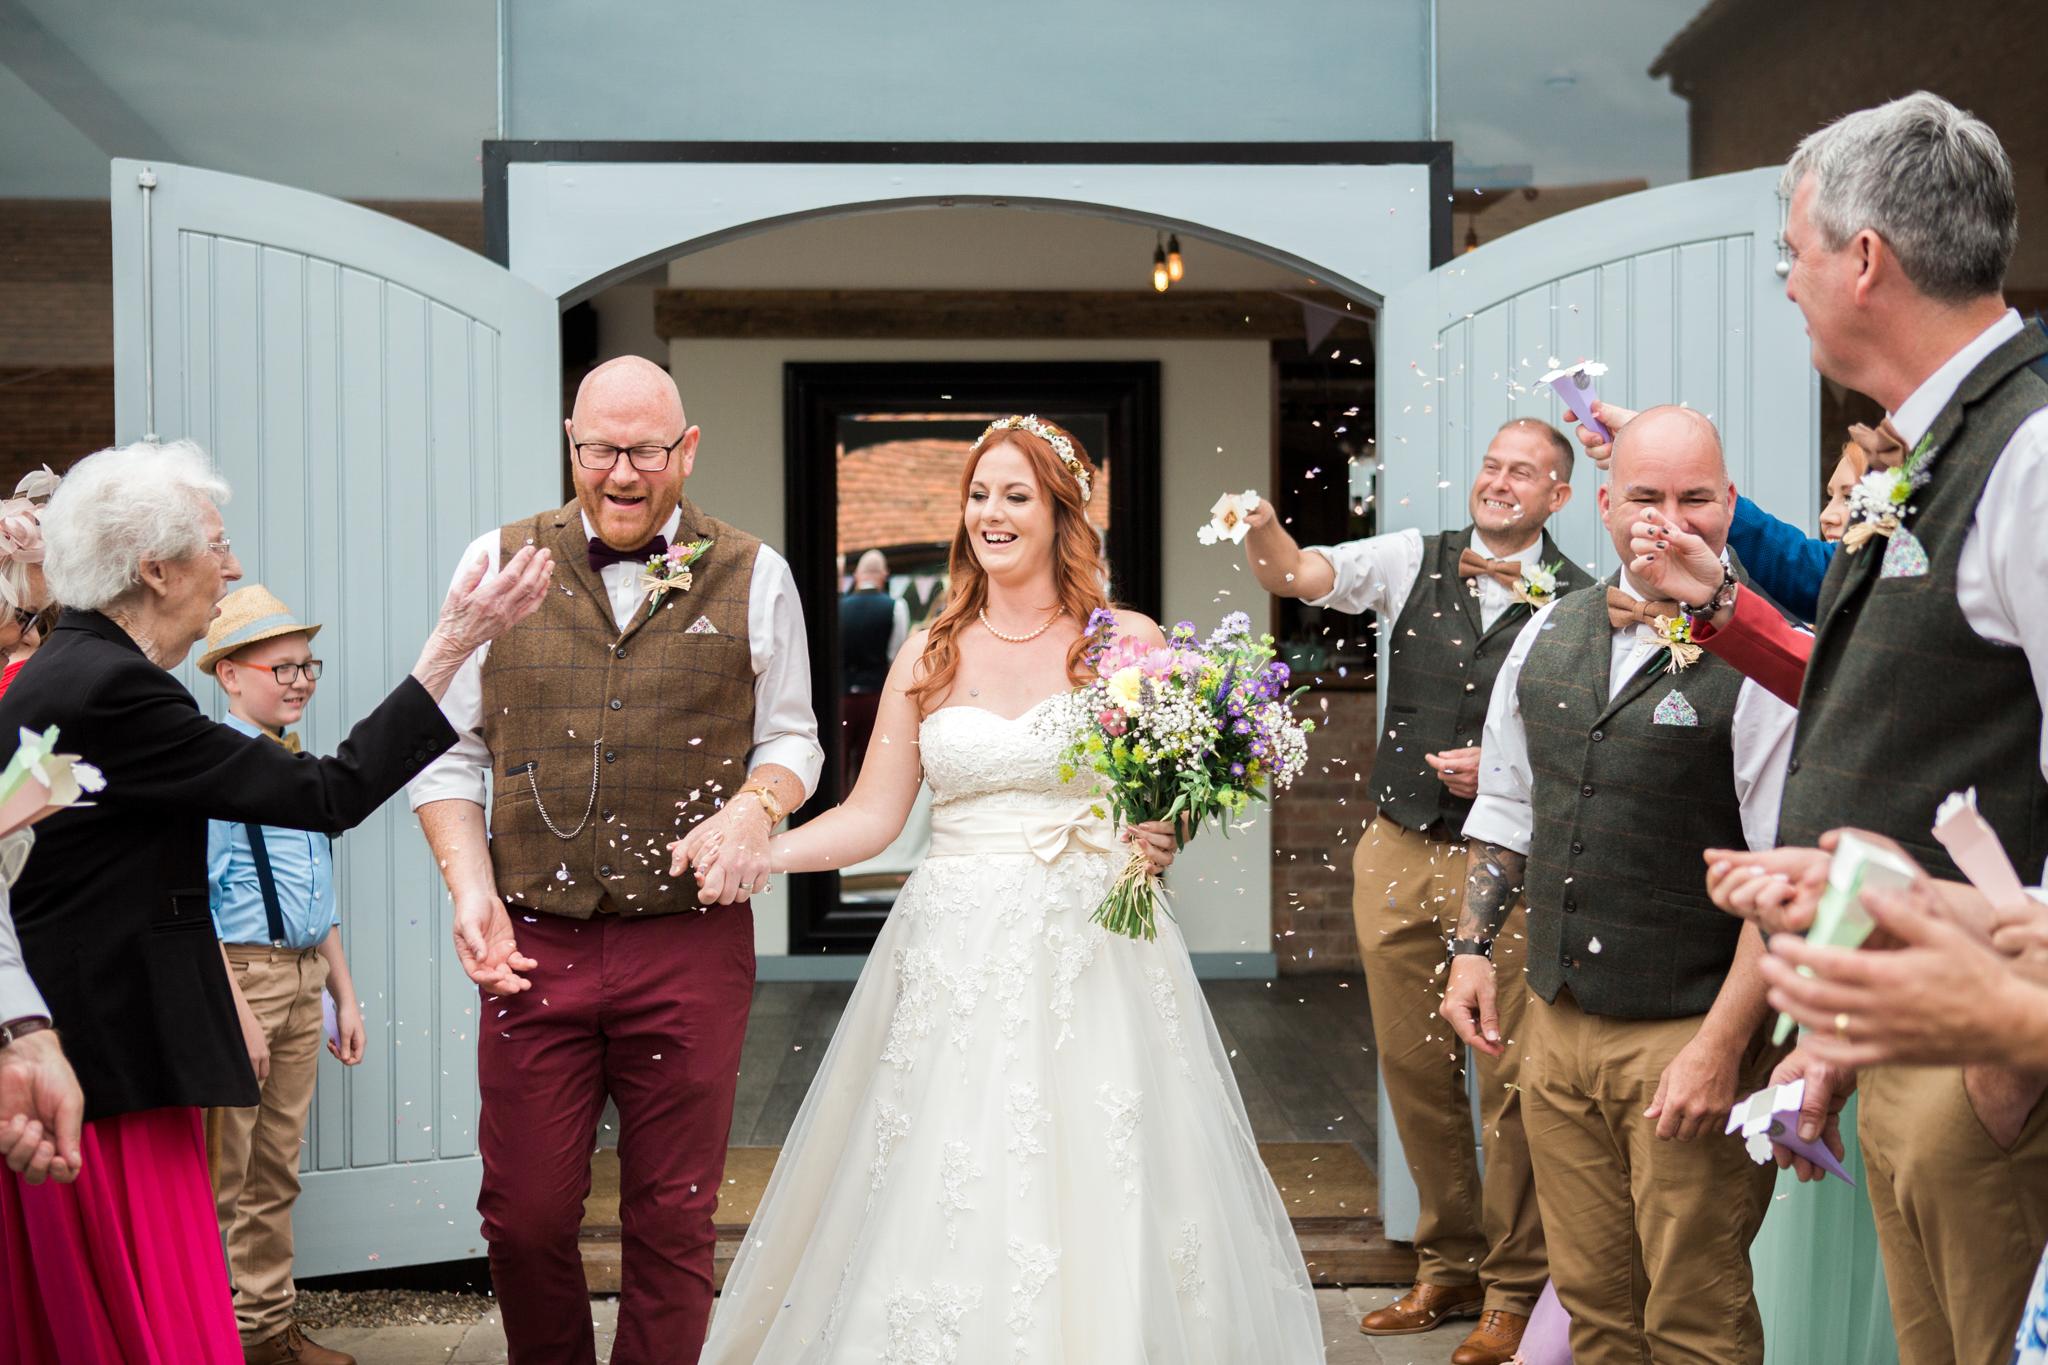 Rowsie & Lee, Swallows Nest Barn Wedding, Cotswold wedding photographer, Warwickshire Wedding Photographer-60.jpg